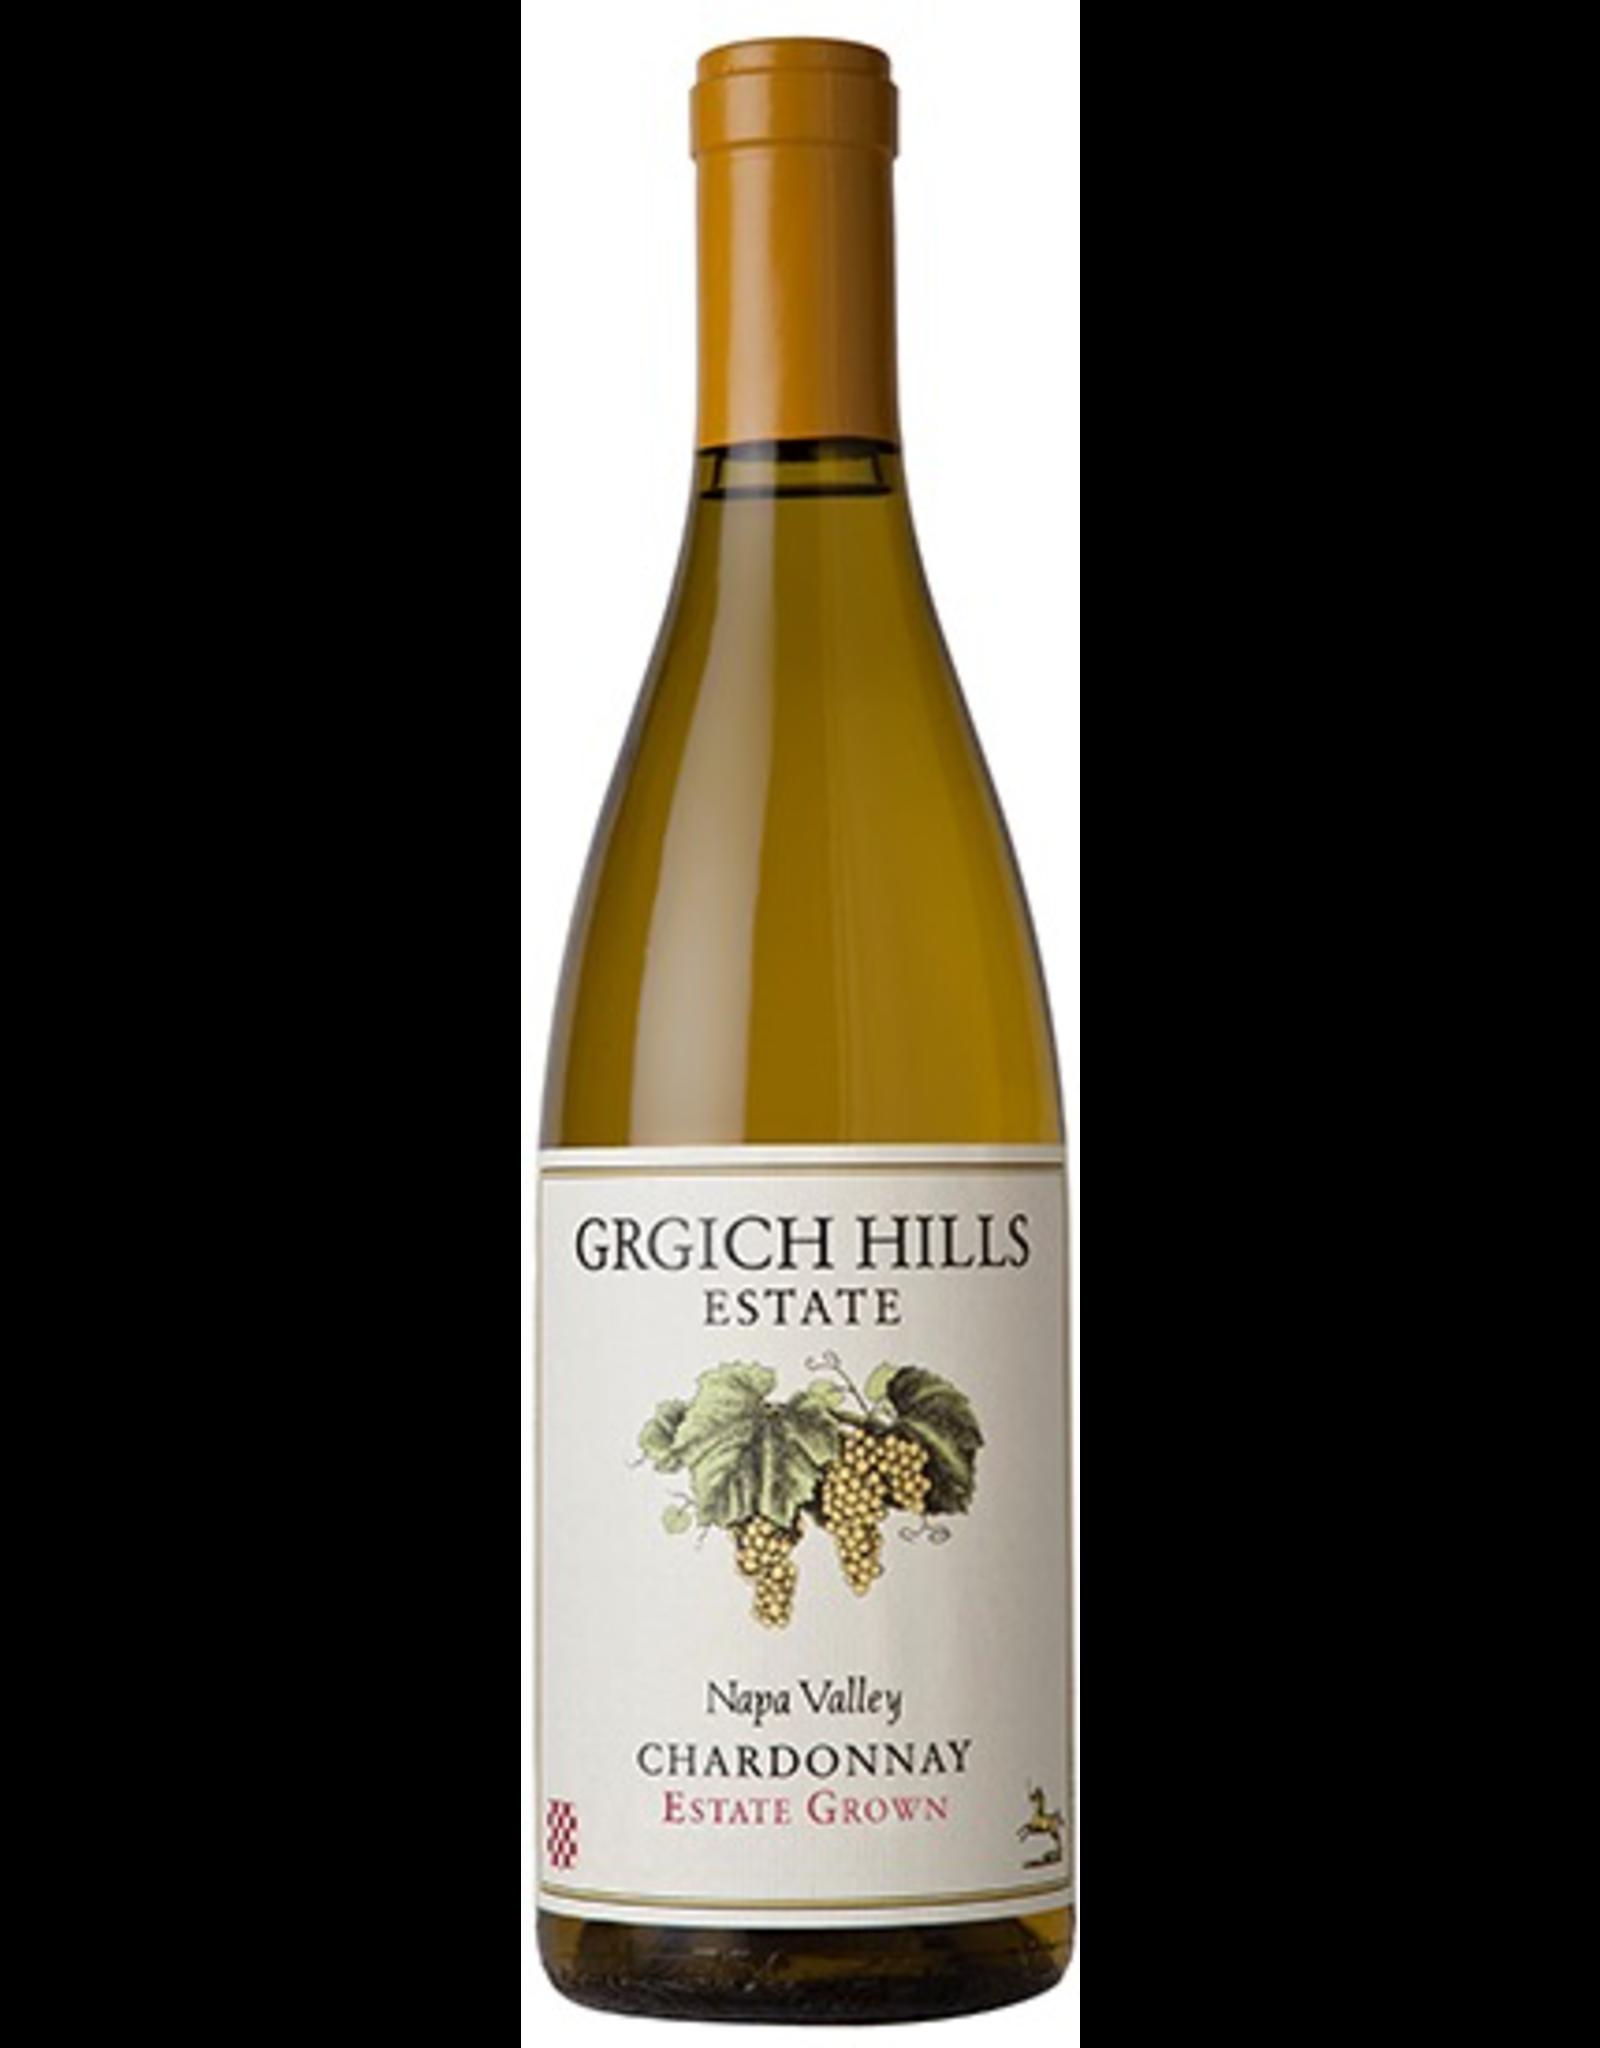 White Wine 2017, Grgich Hills Estate, Chardonnay, Napa Valley, Napa, California, 13.55 Alc, CTnr, TW93